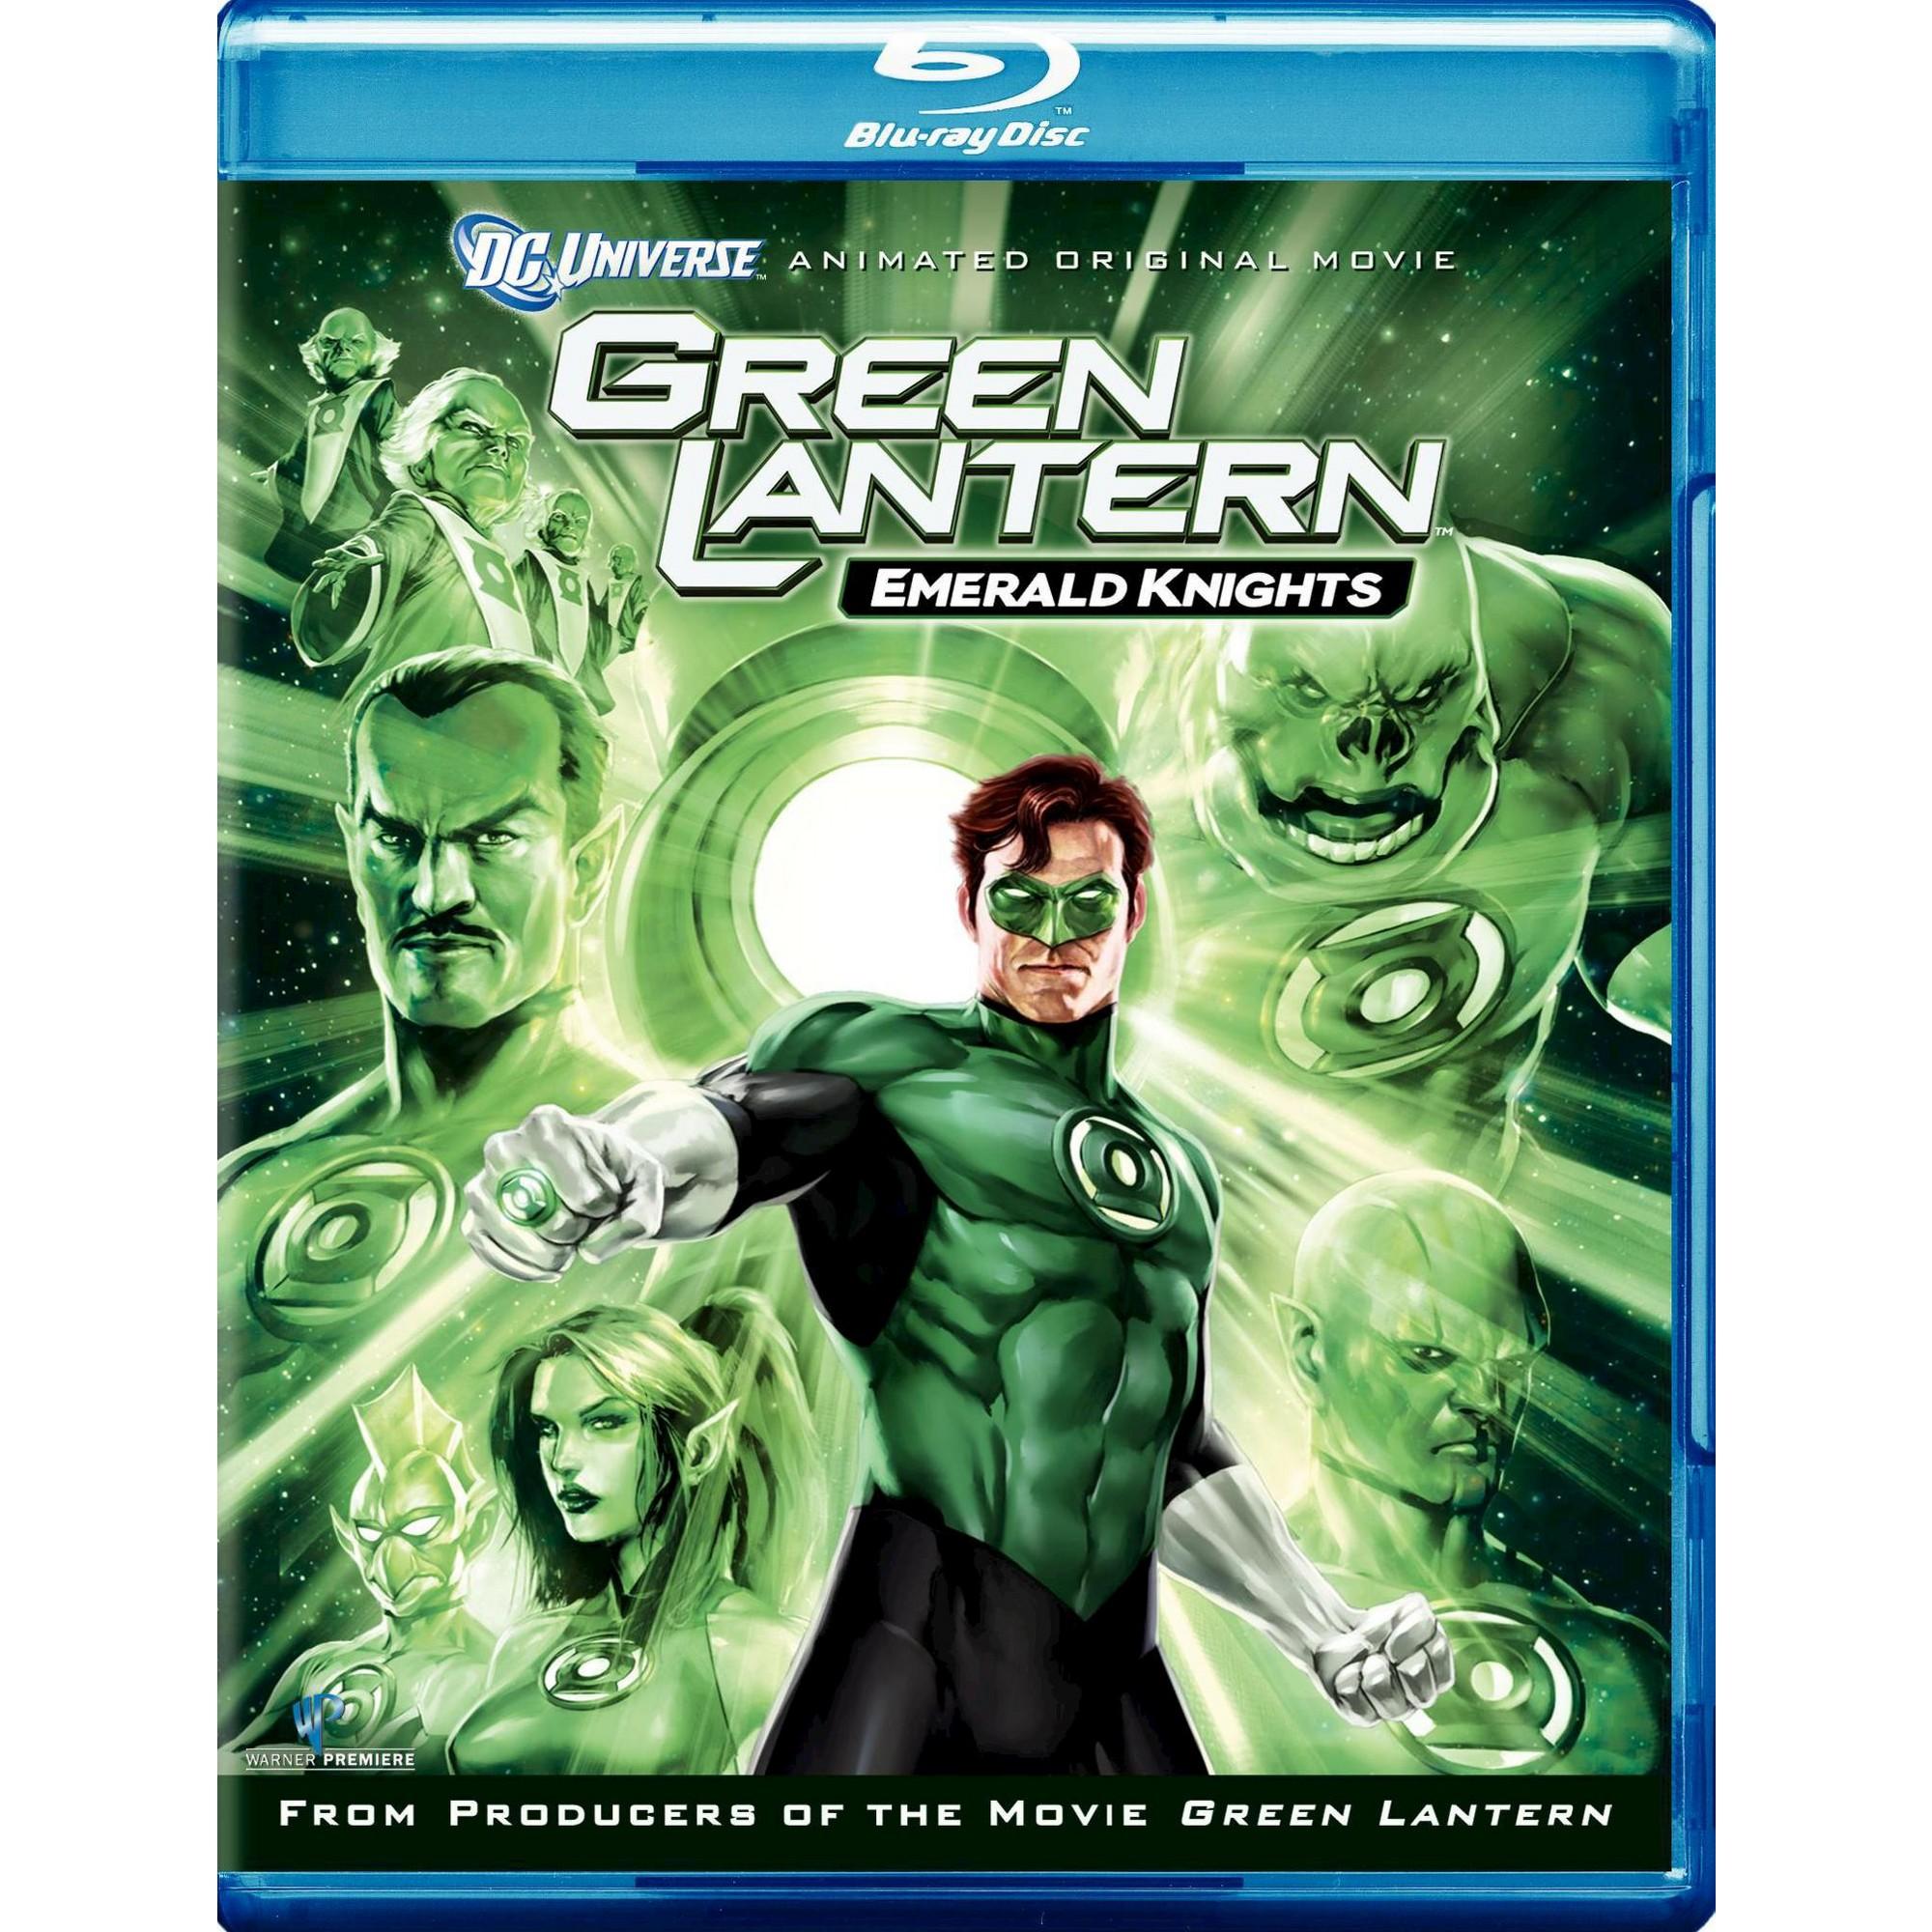 Green Lantern: Emerald Knights (Blu-ray)